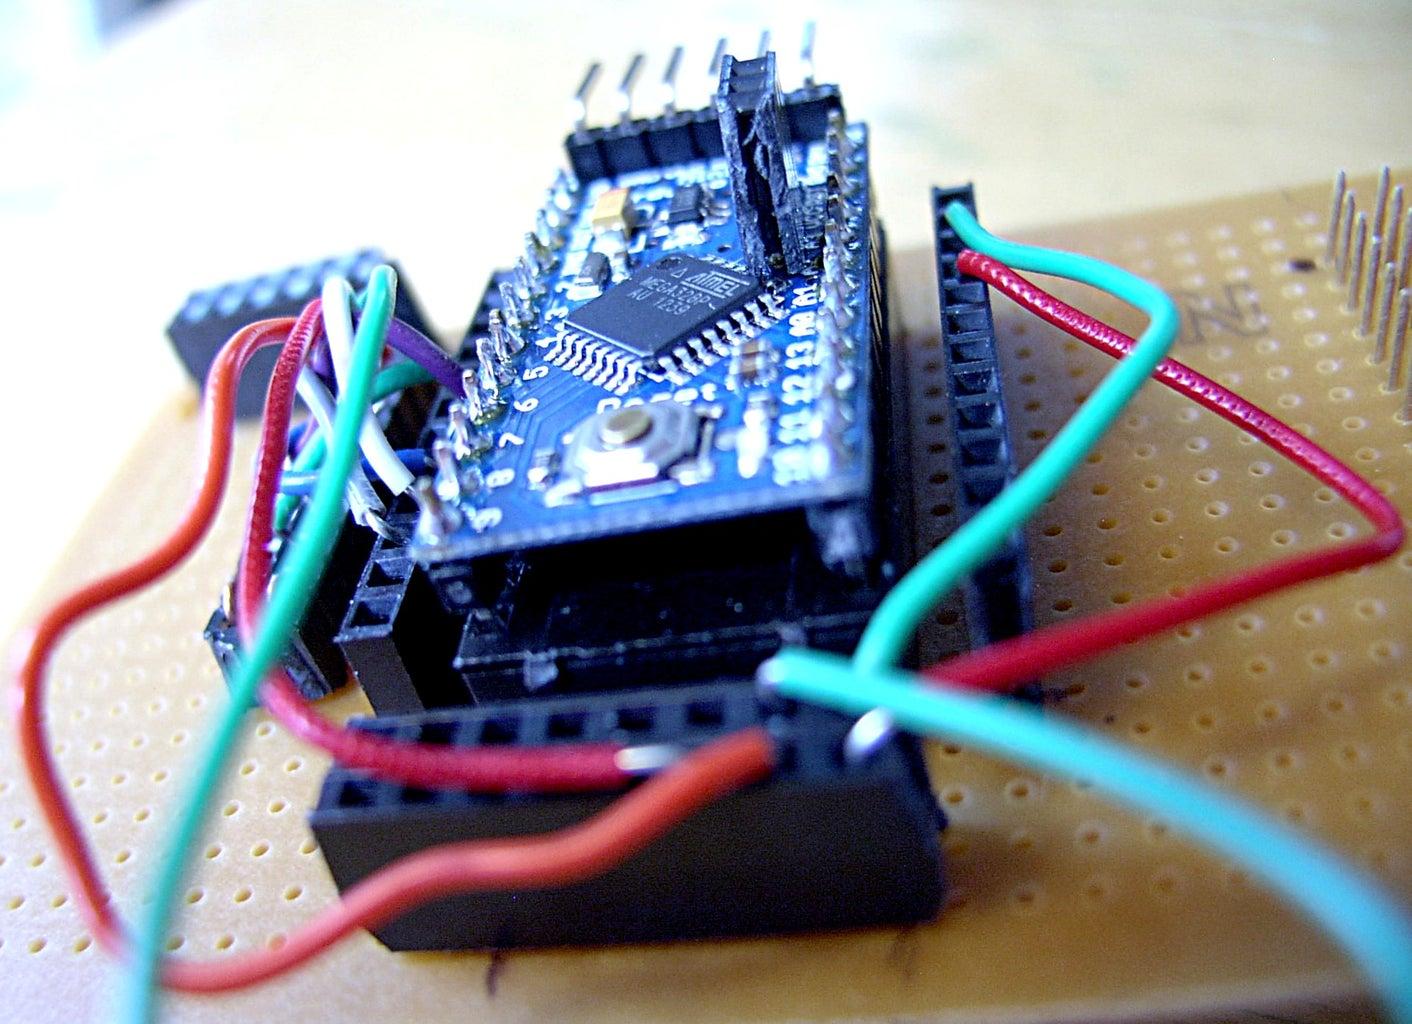 Wiring It Up: Part 1